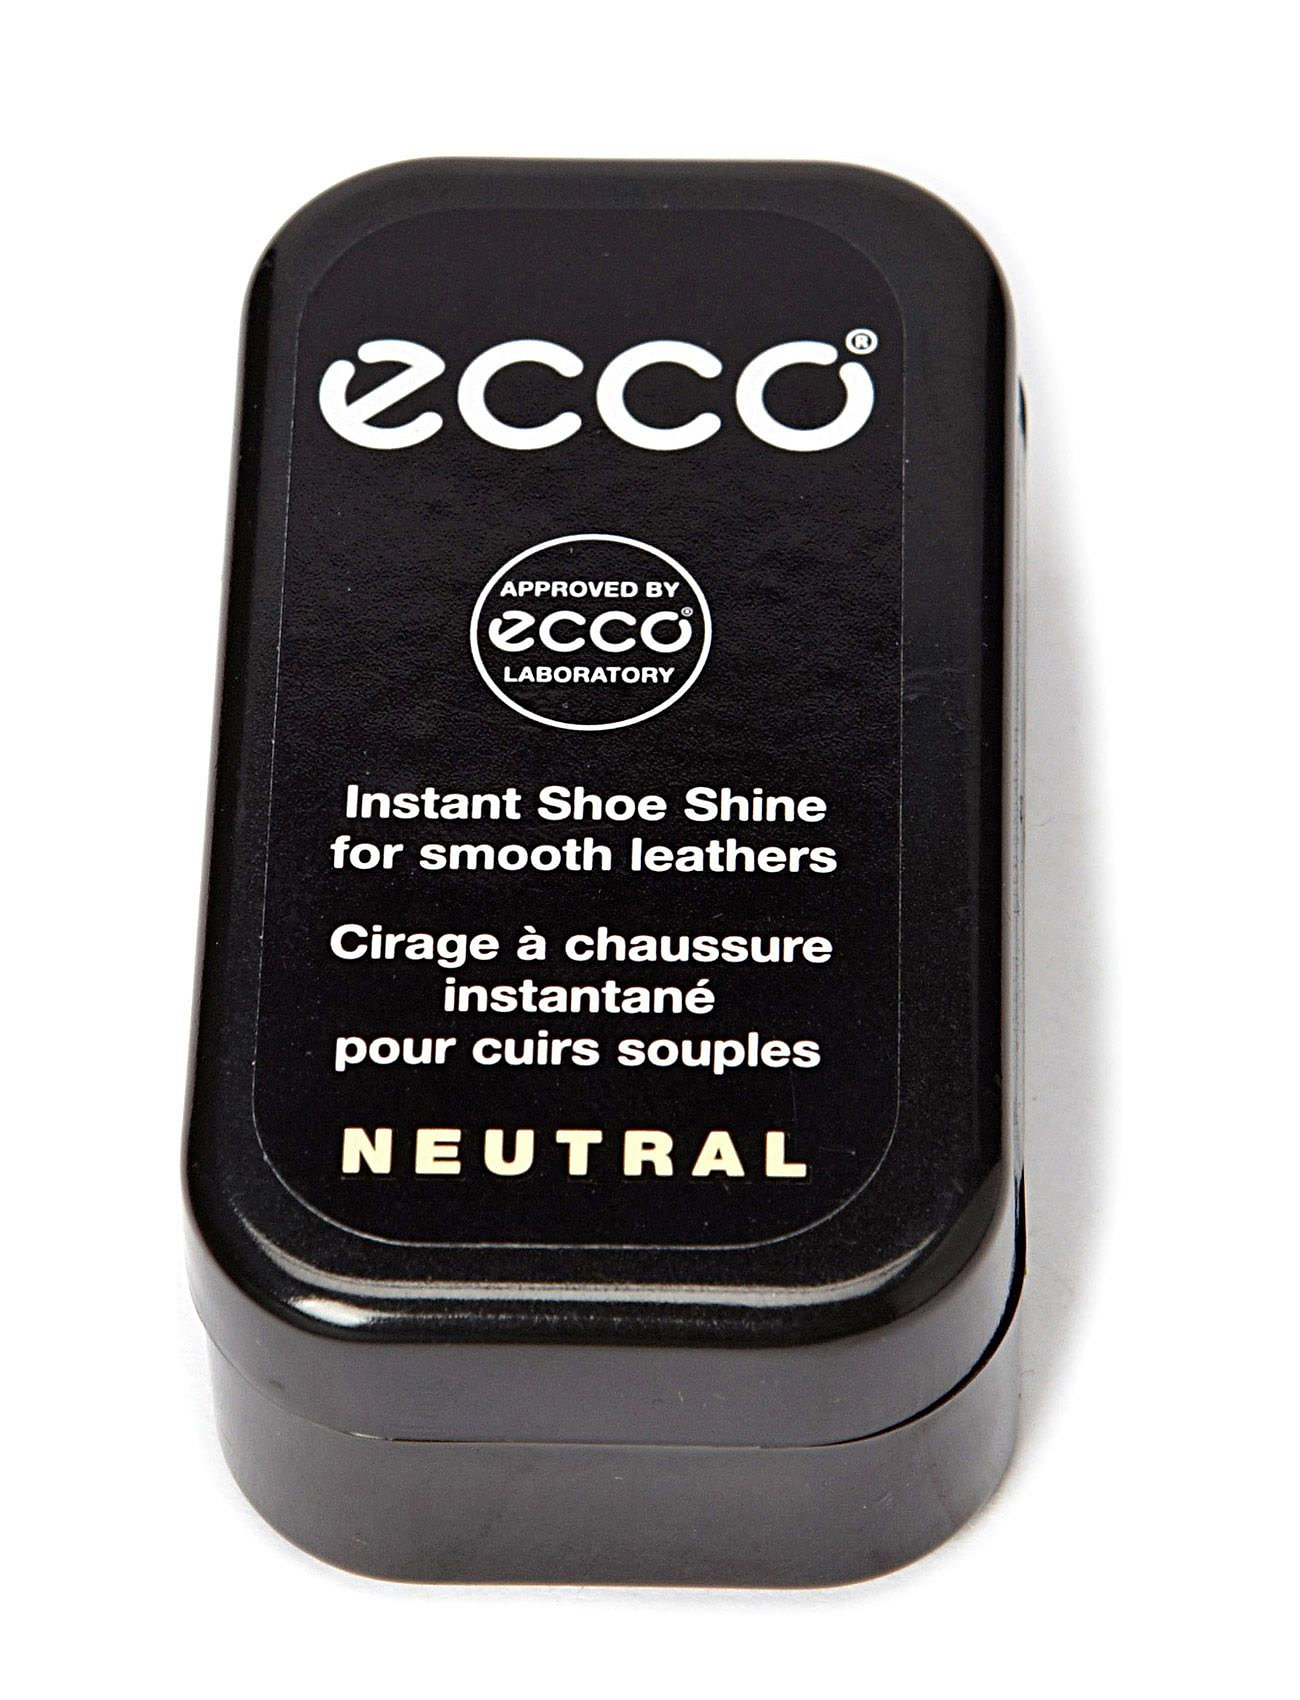 ECCO Shoe Care Clean